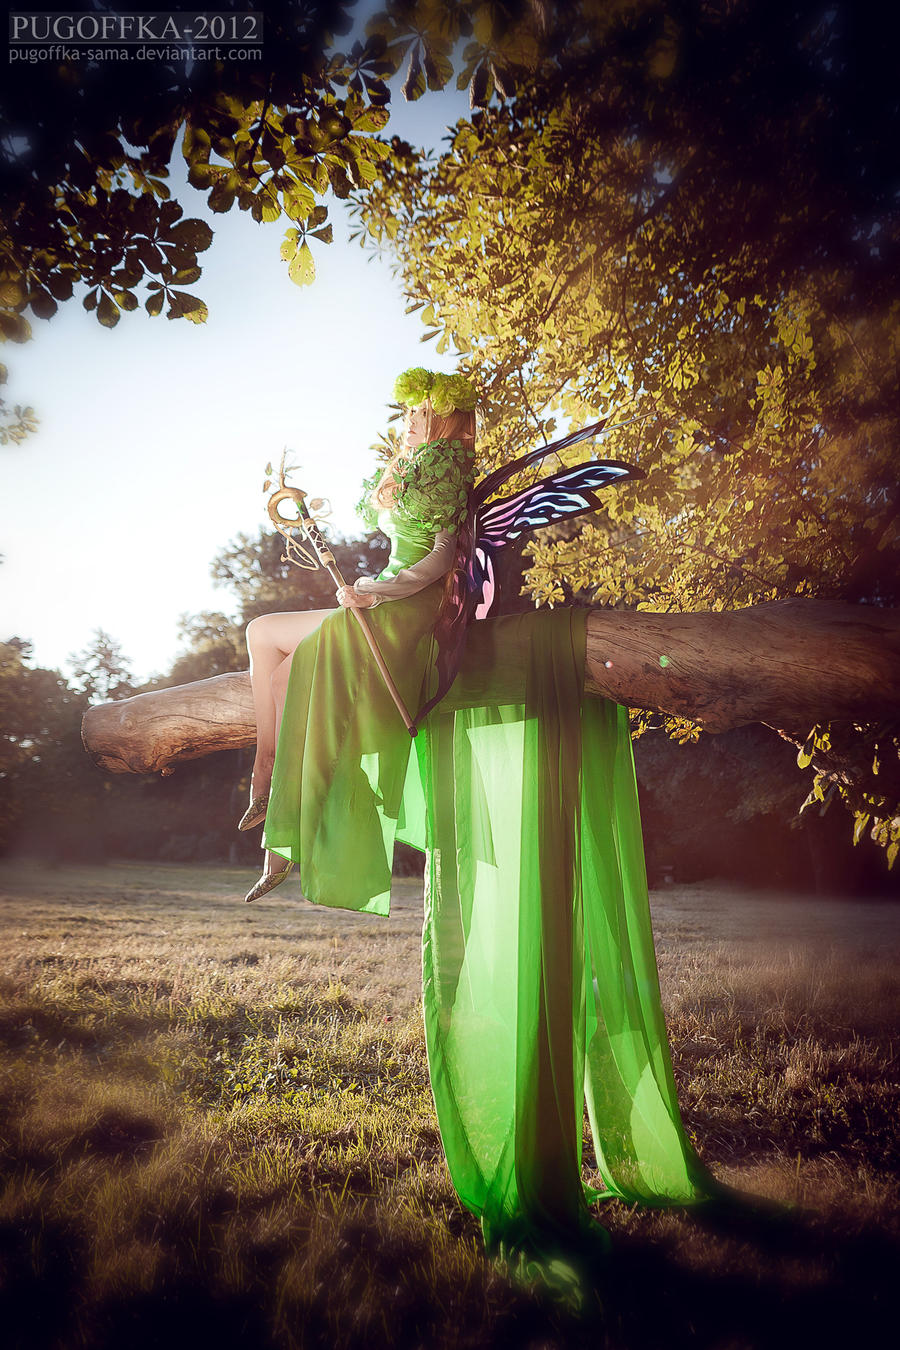 Odin Sphere-Queen Elfaria by Pugoffka-sama